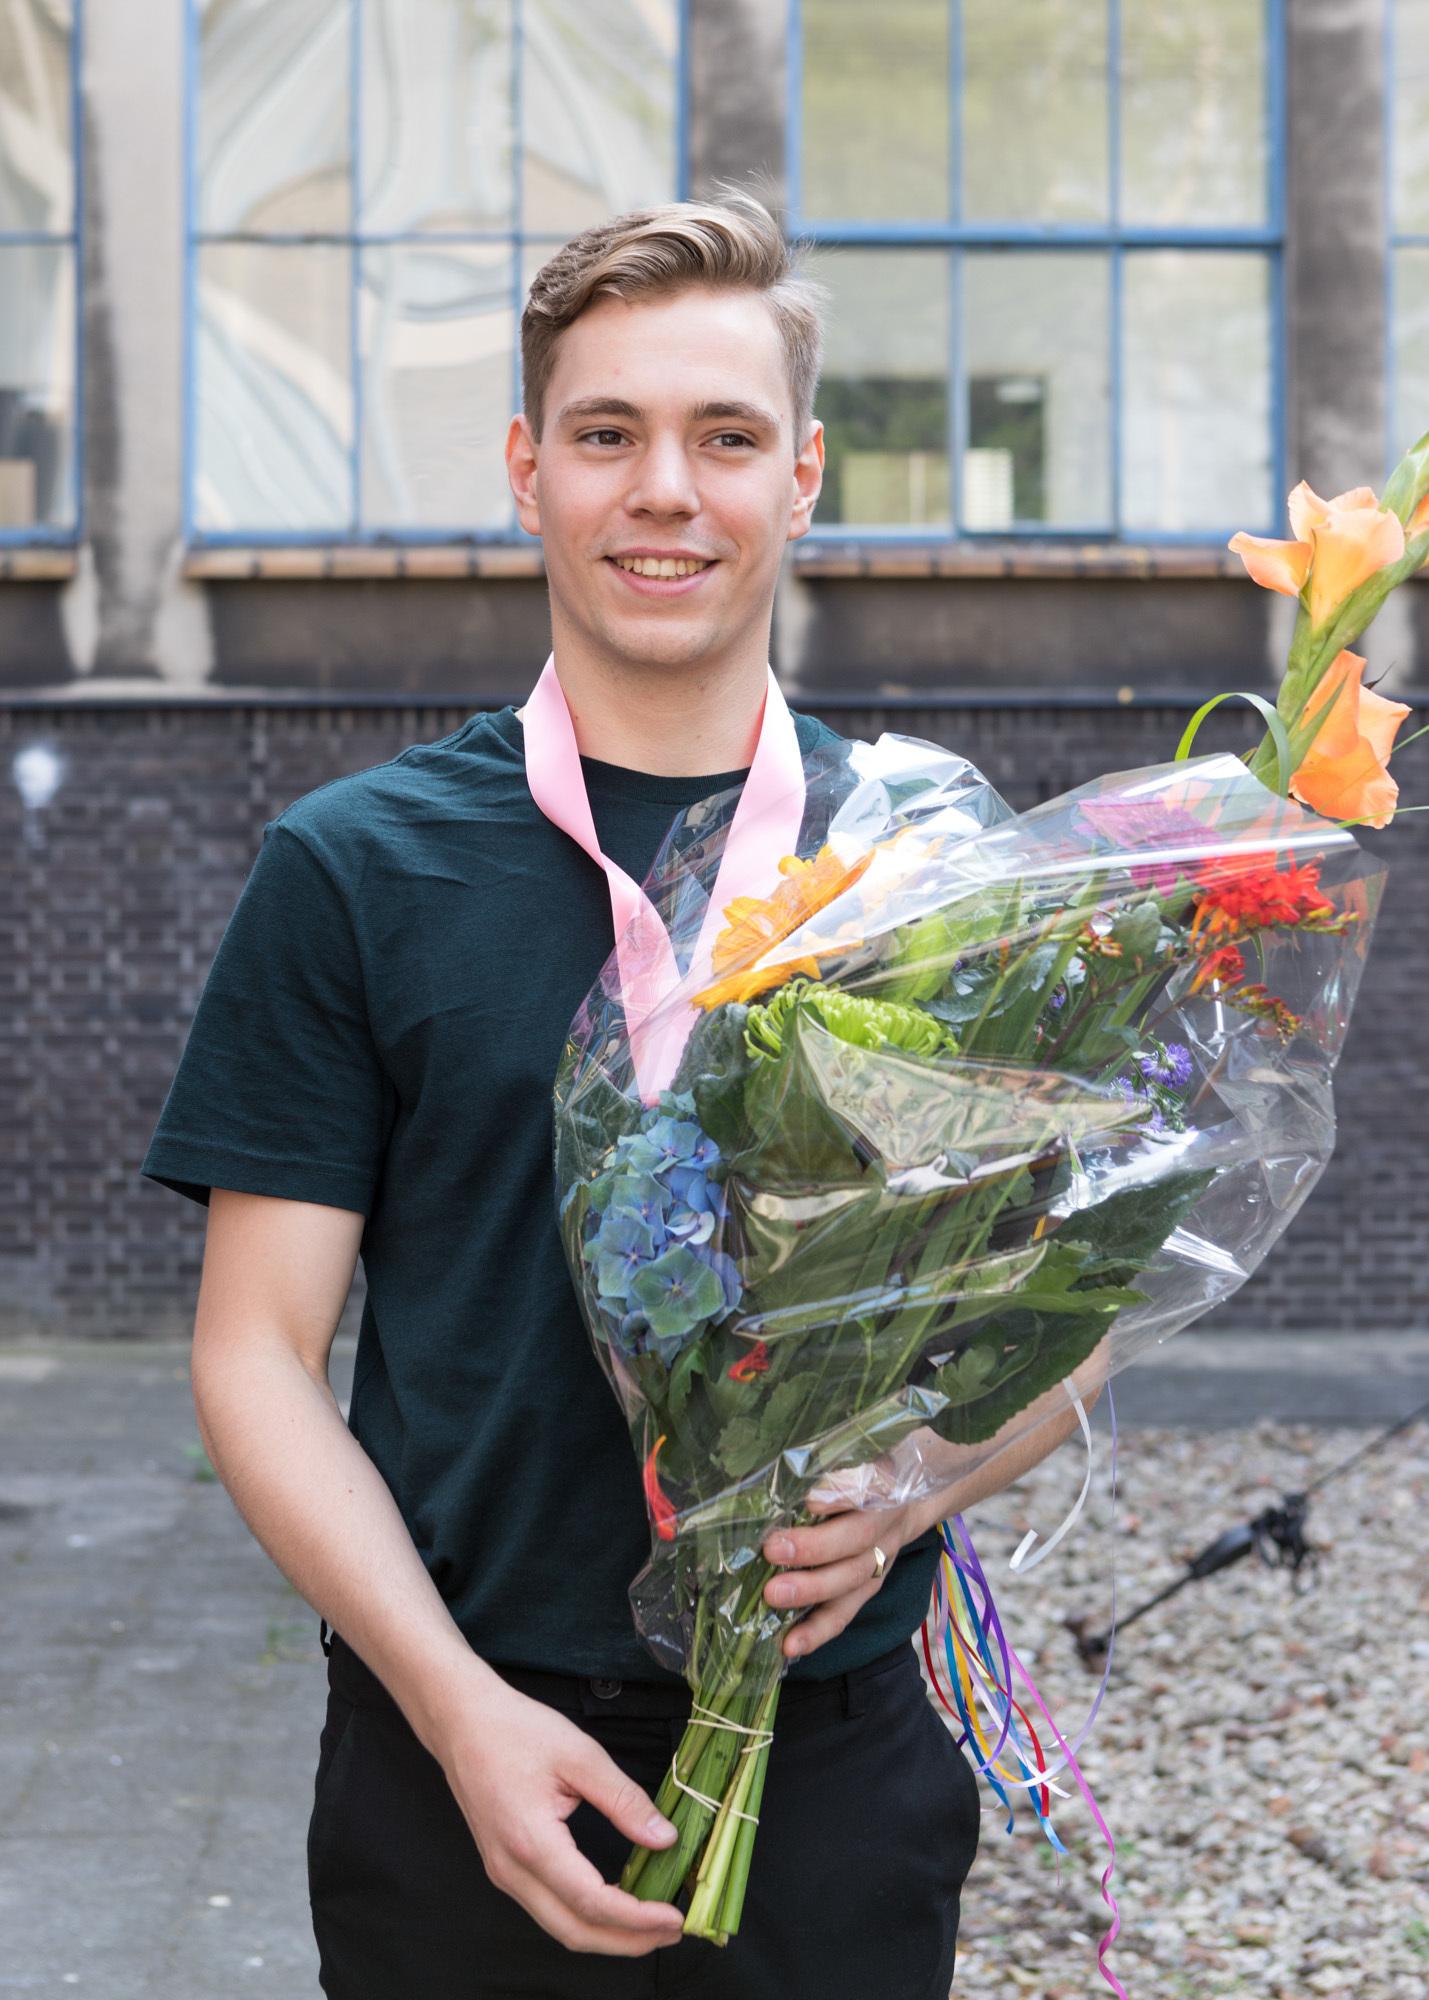 Koenraad de Groot, winner Royal Academy Masters Award